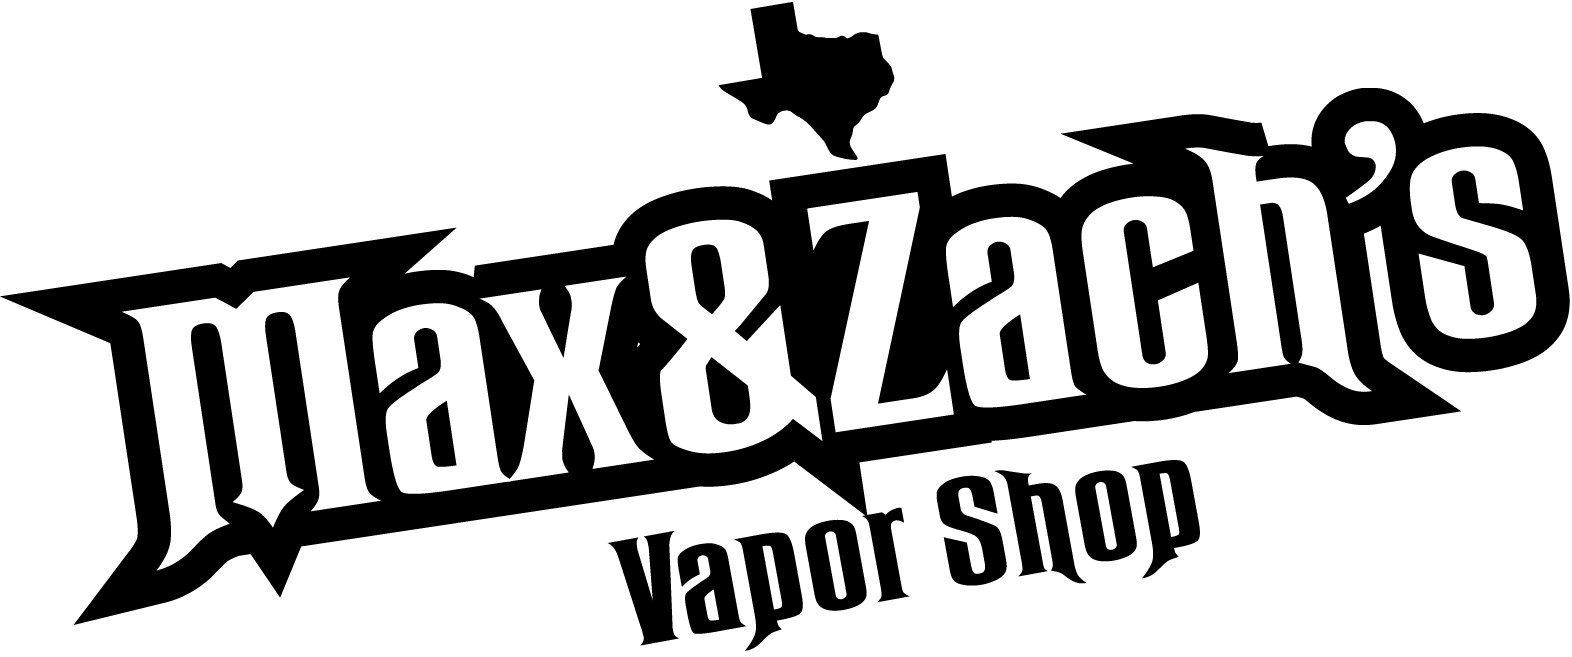 Max and Zach's Vapor Shops